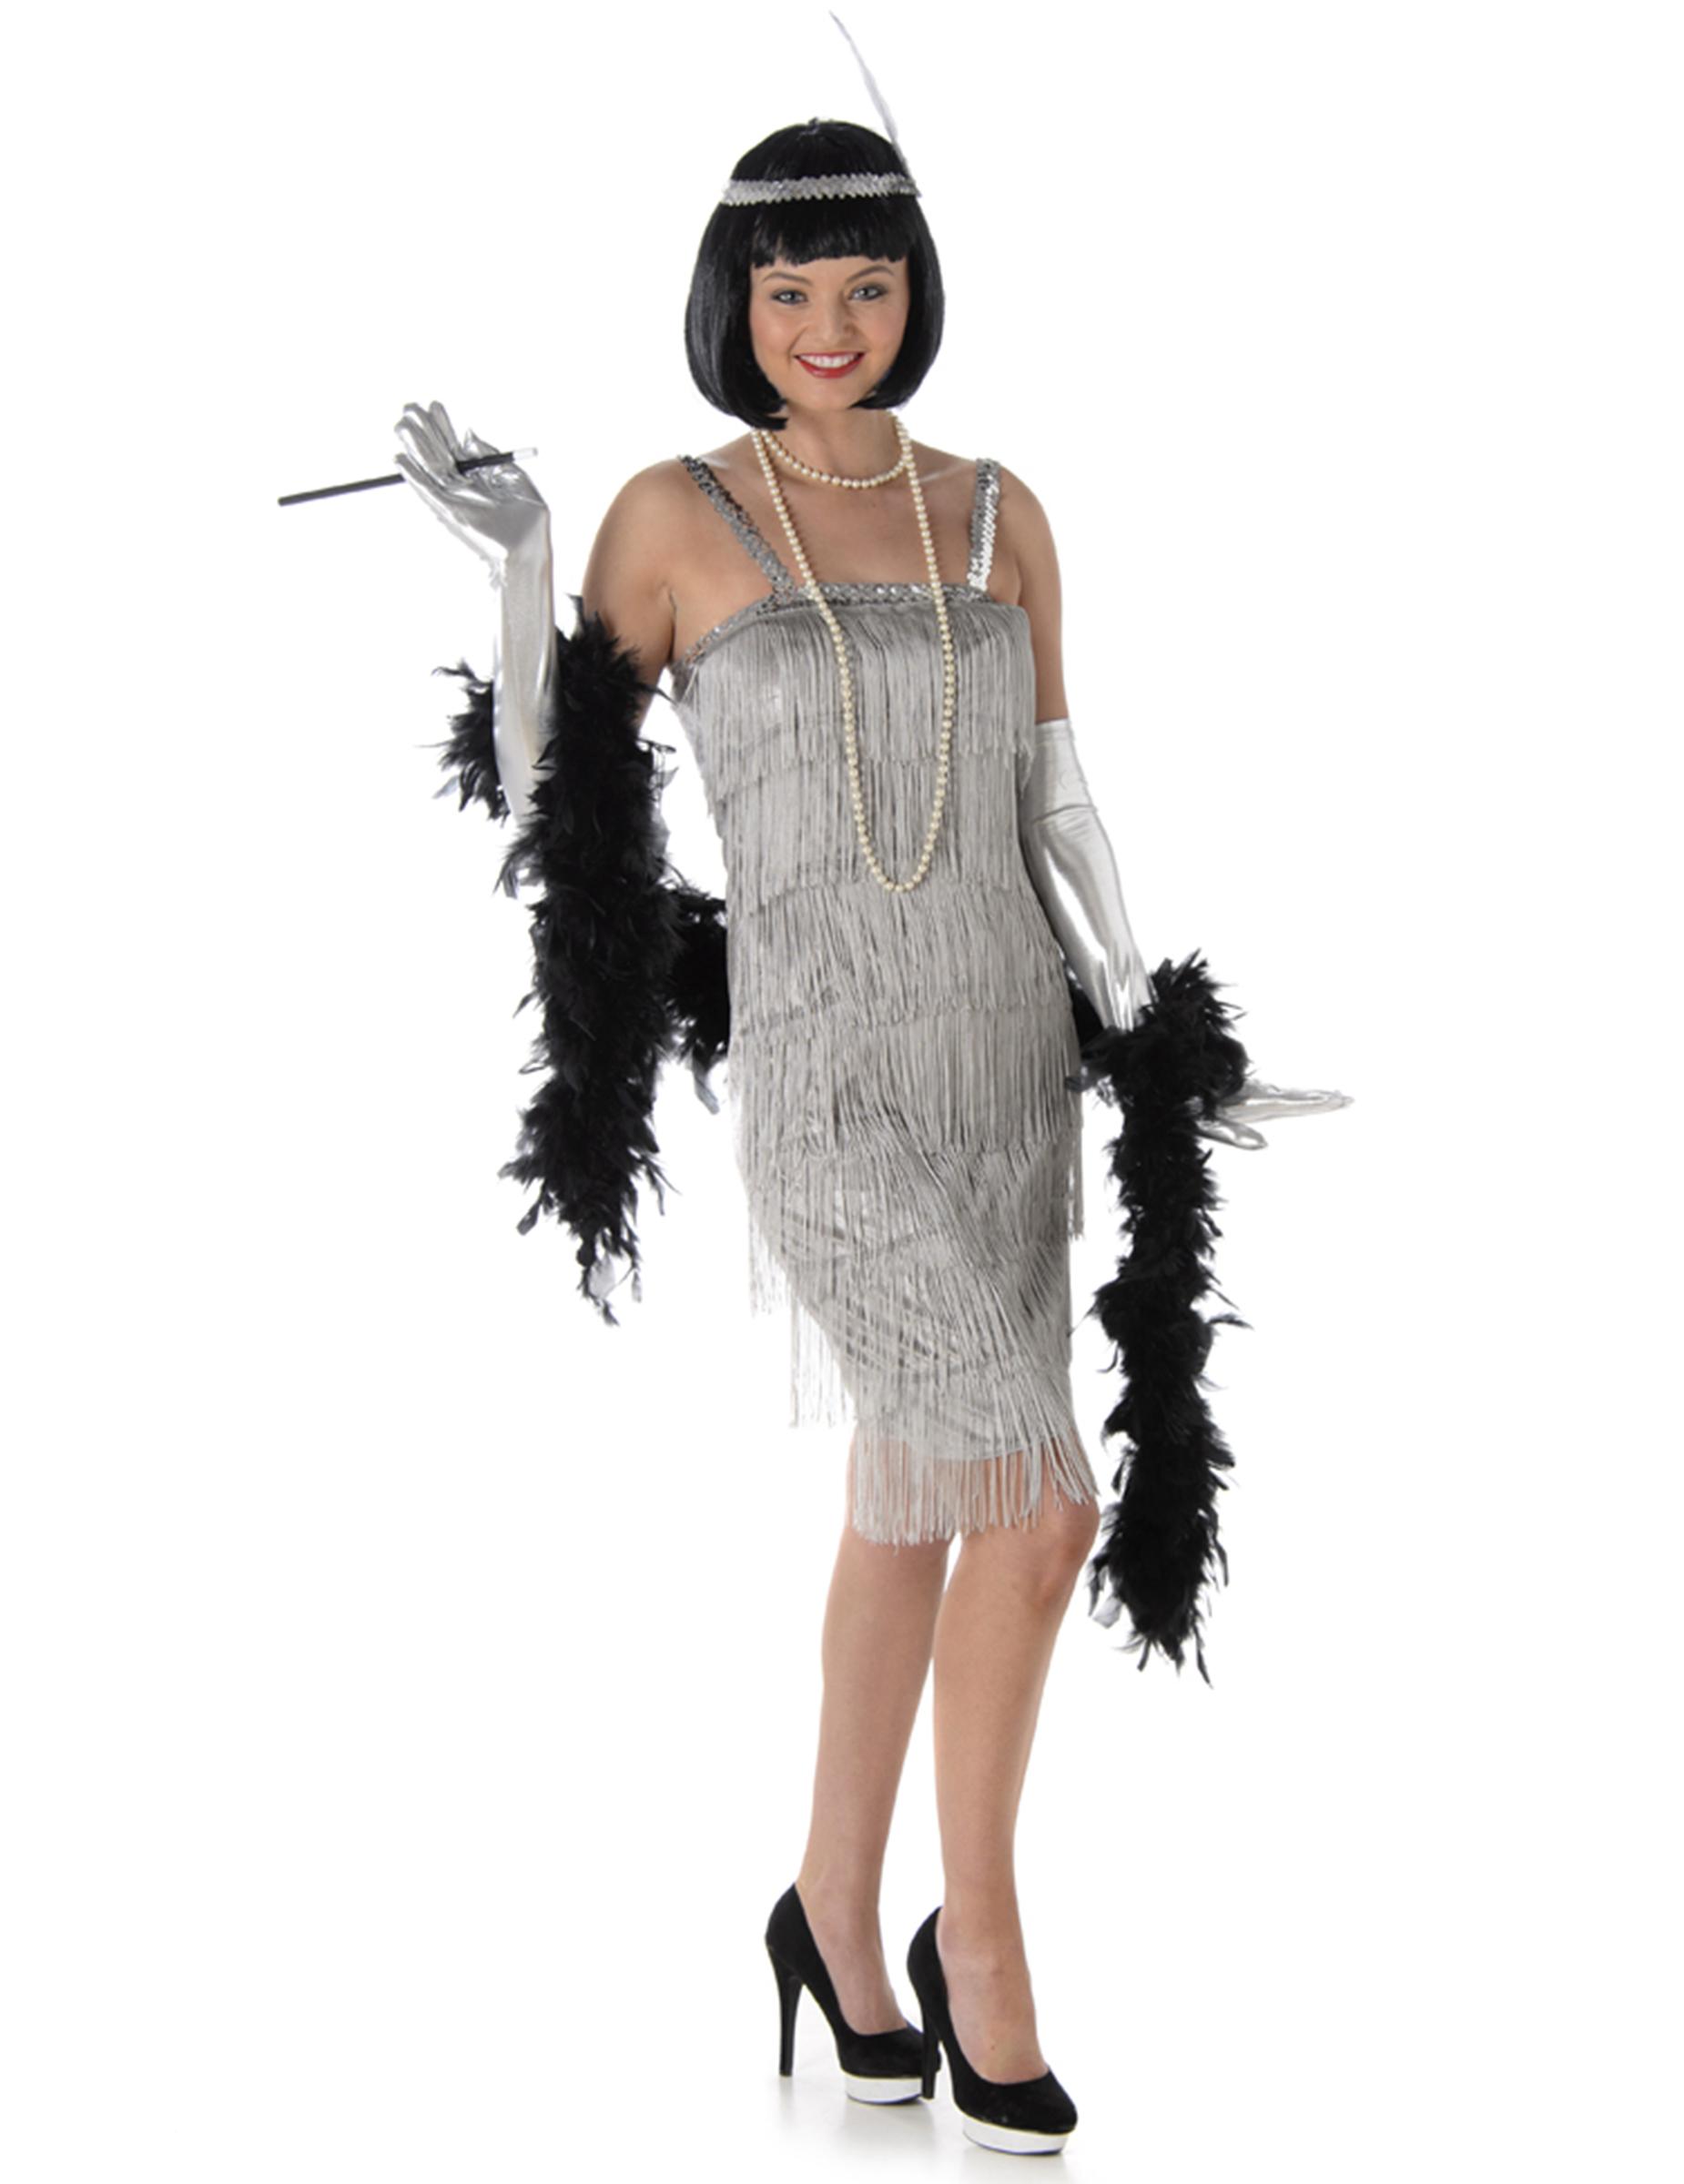 Retro charleston kostuum voor vrouwen - Vegaoo.nl